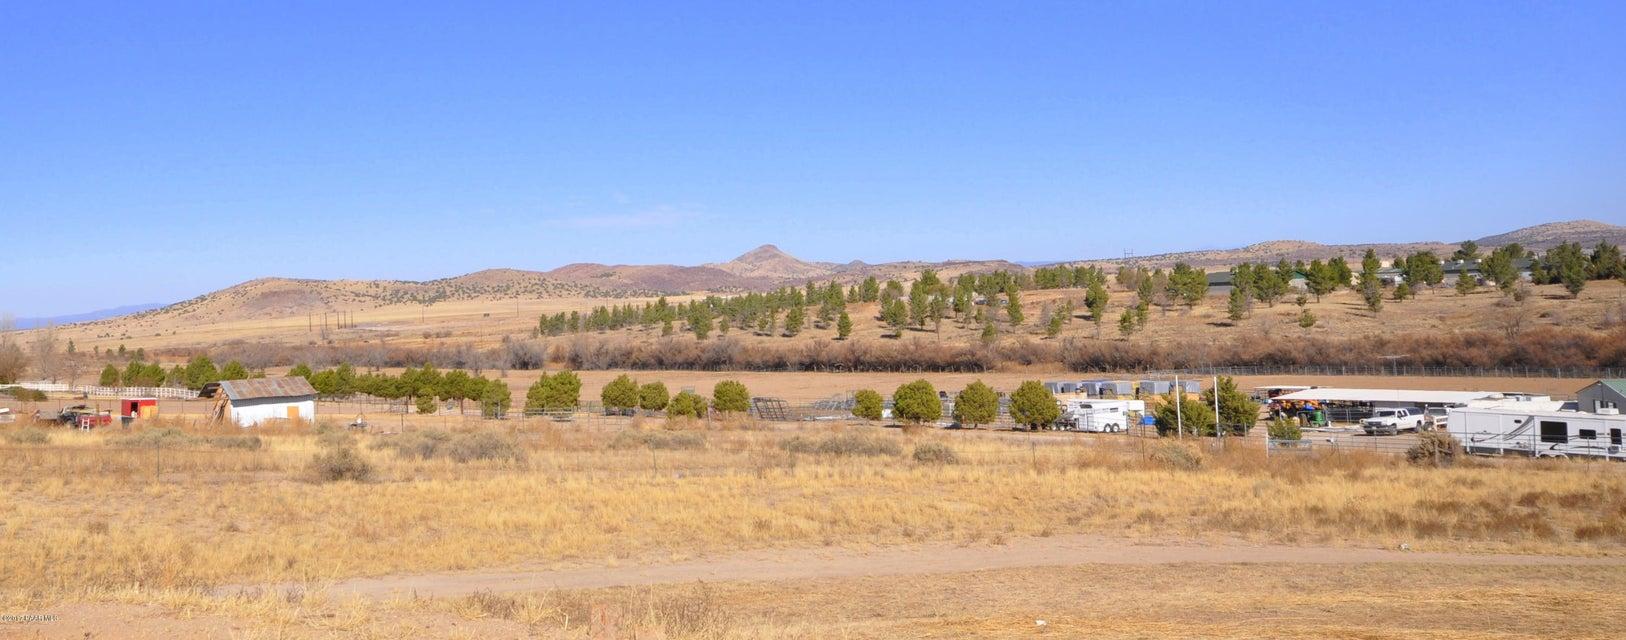 2010 Deer Drive Chino Valley, AZ 86323 - MLS #: 1008316